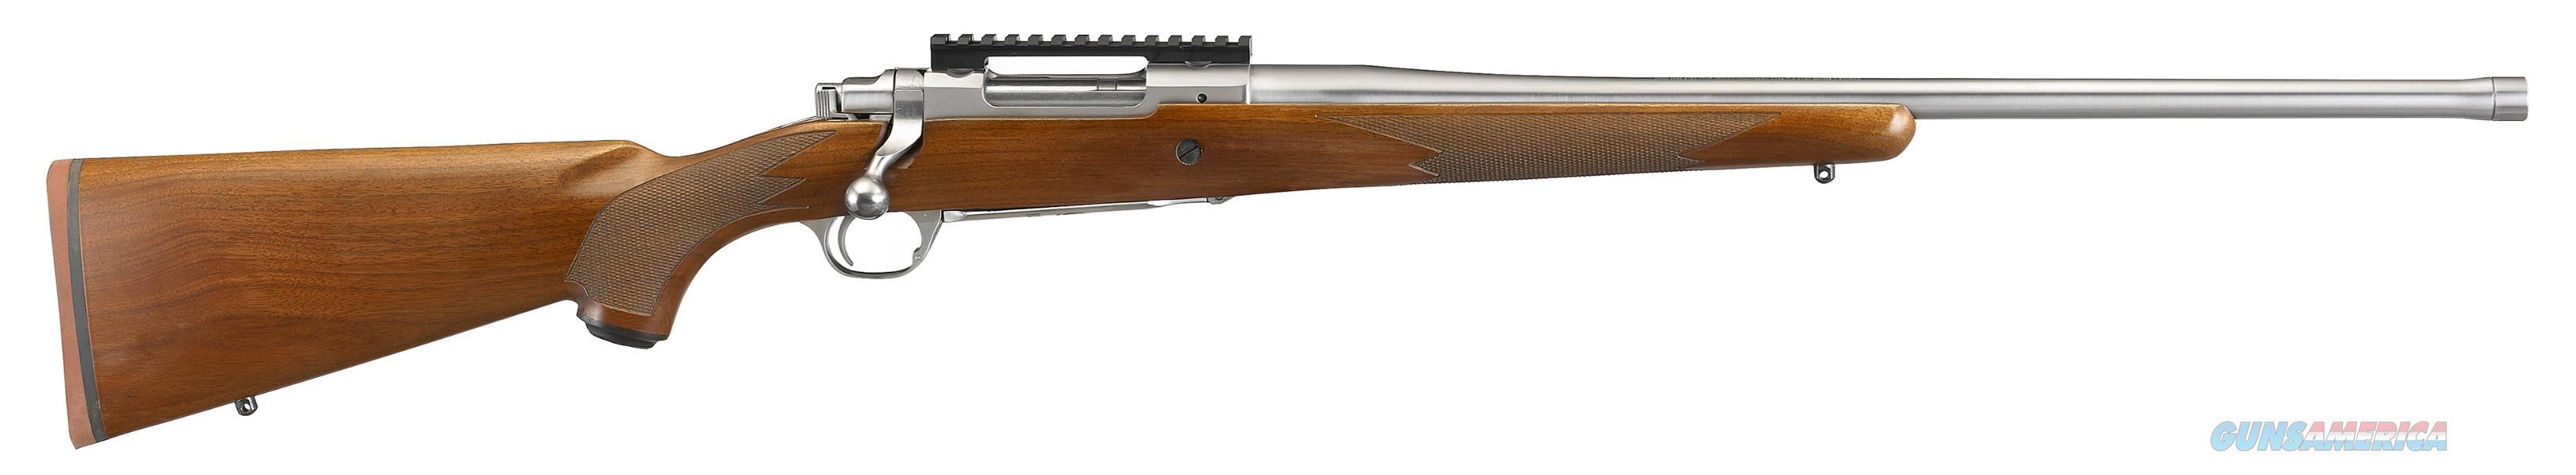 Ruger Hawkeye, Rug 57105 Hawkeye Hunter   6.5prc 22 Wal Satin Ss  Guns > Pistols > 1911 Pistol Copies (non-Colt)